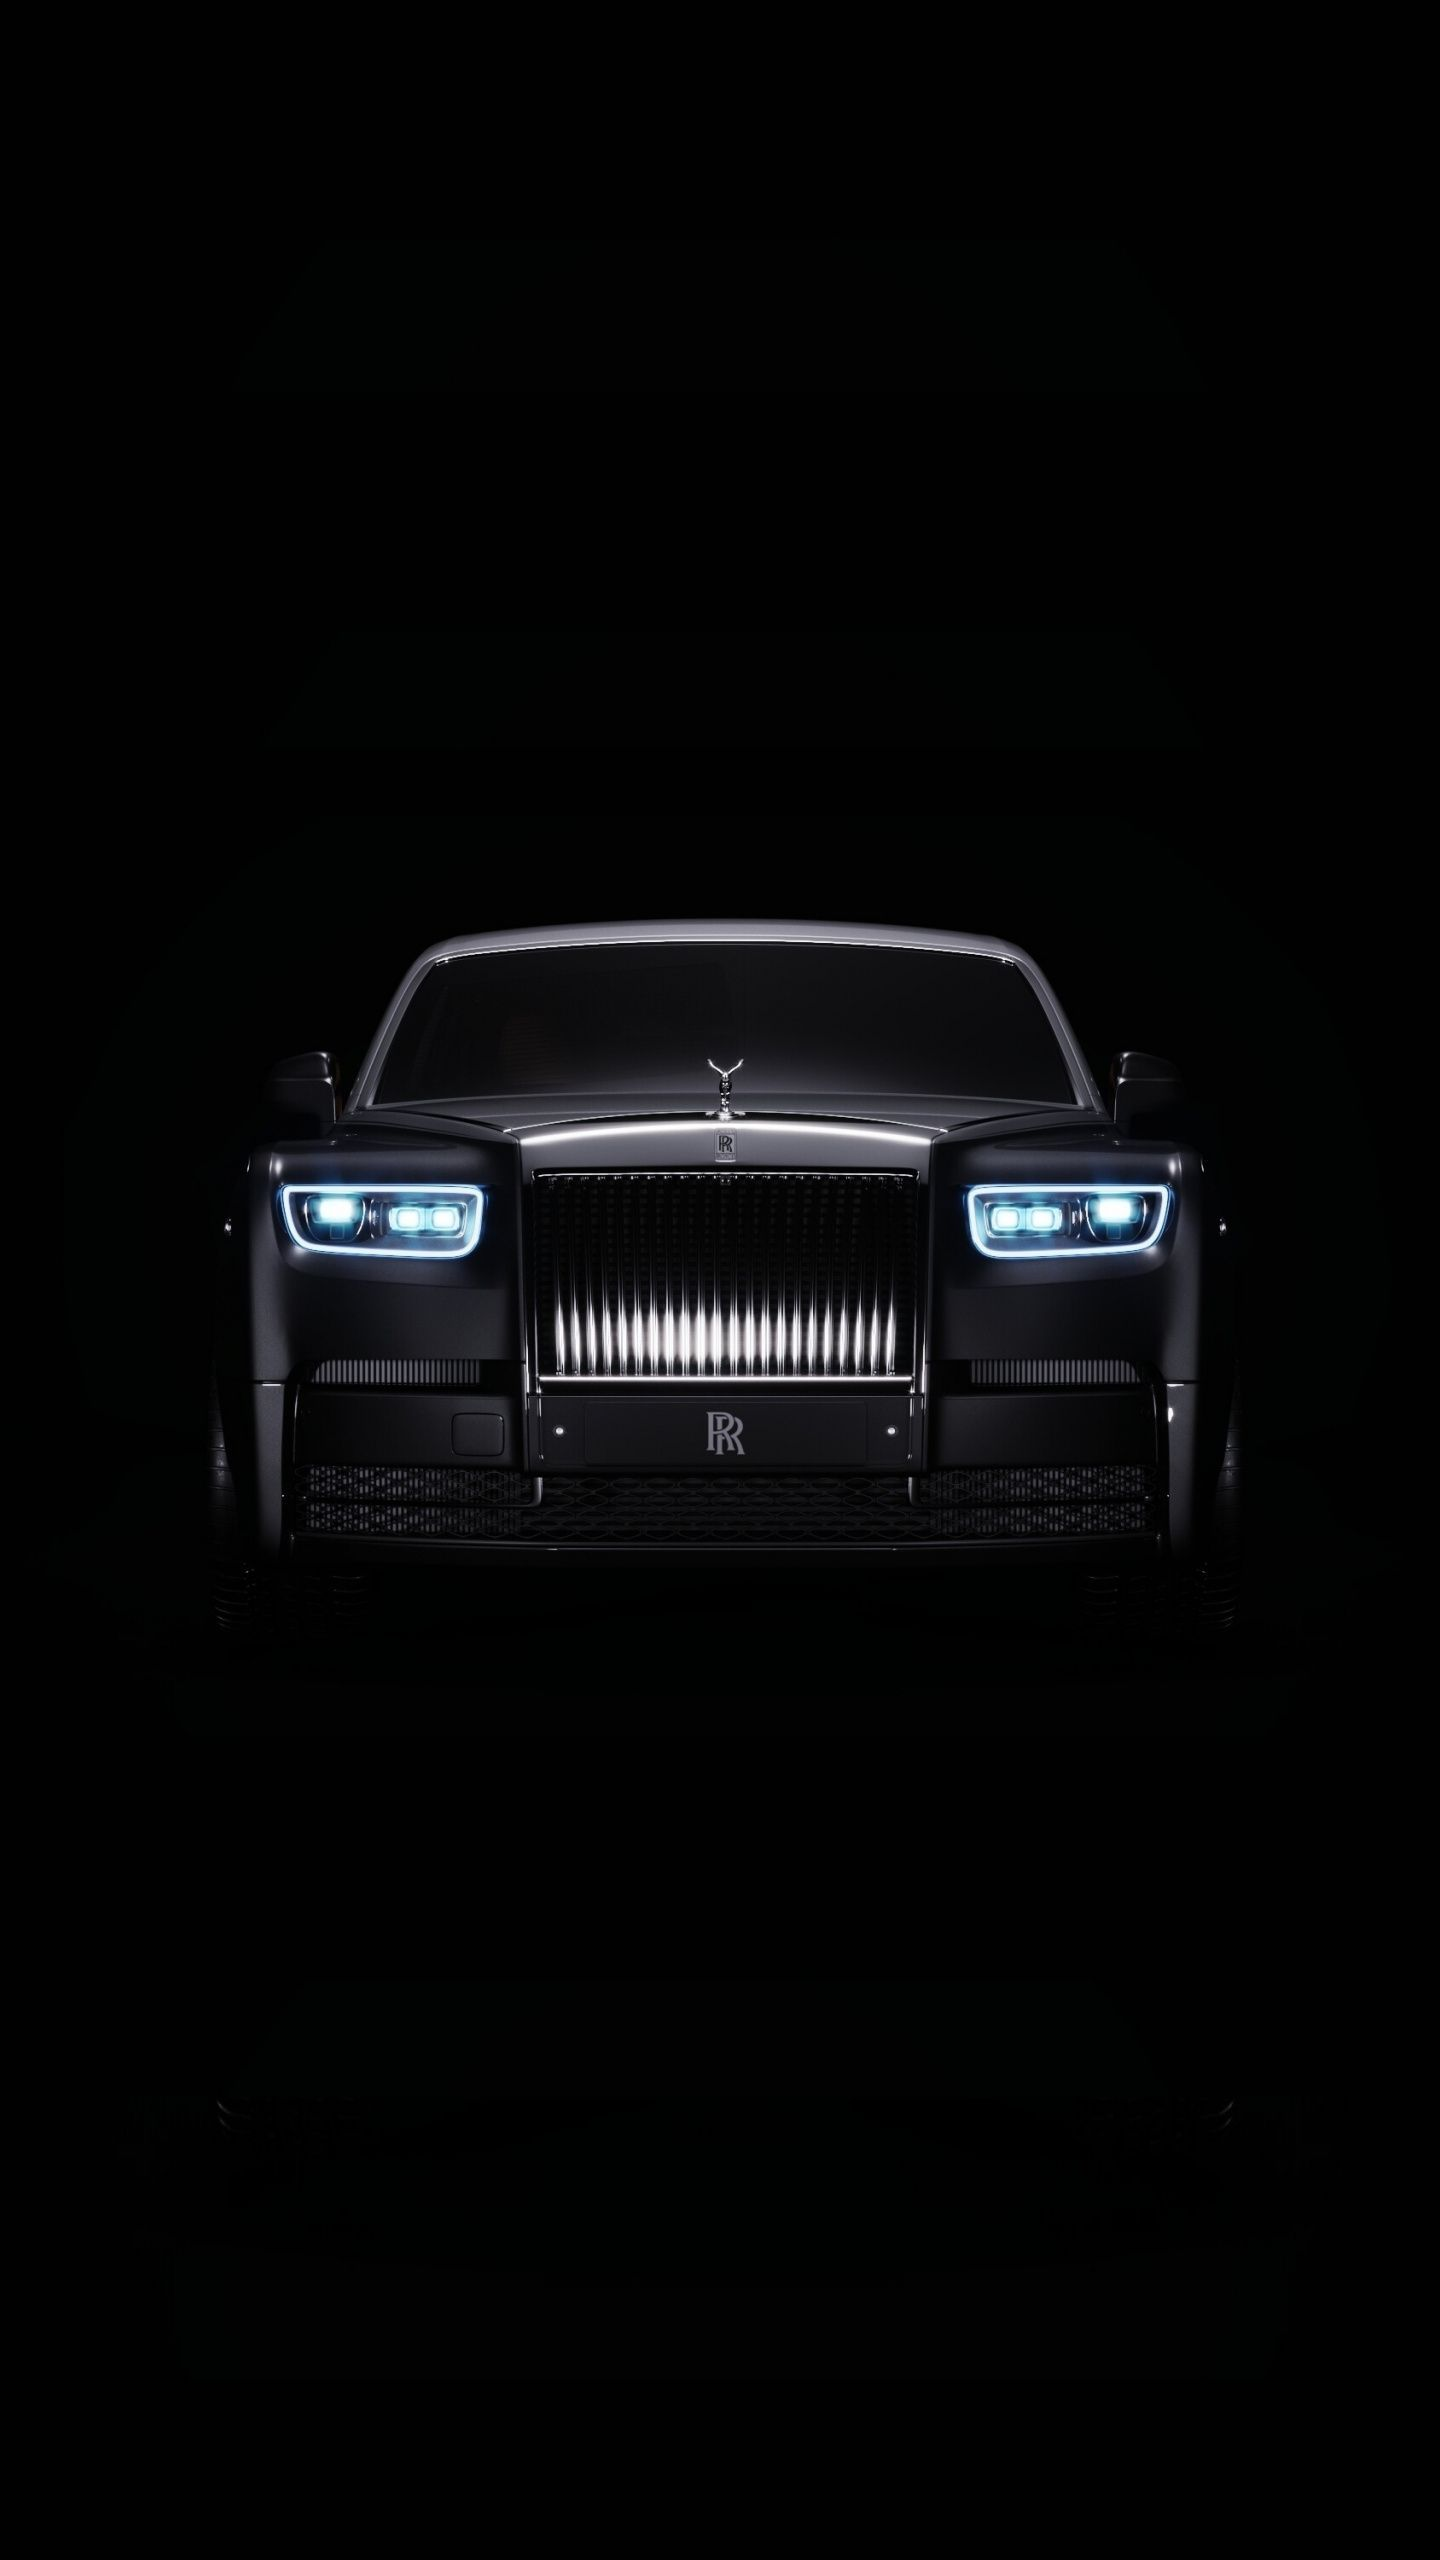 440x2560 Front Rolls Royce Phantom Portrait Rolls Royce Wallpaper Rolls Royce Phantom Rolls Royce